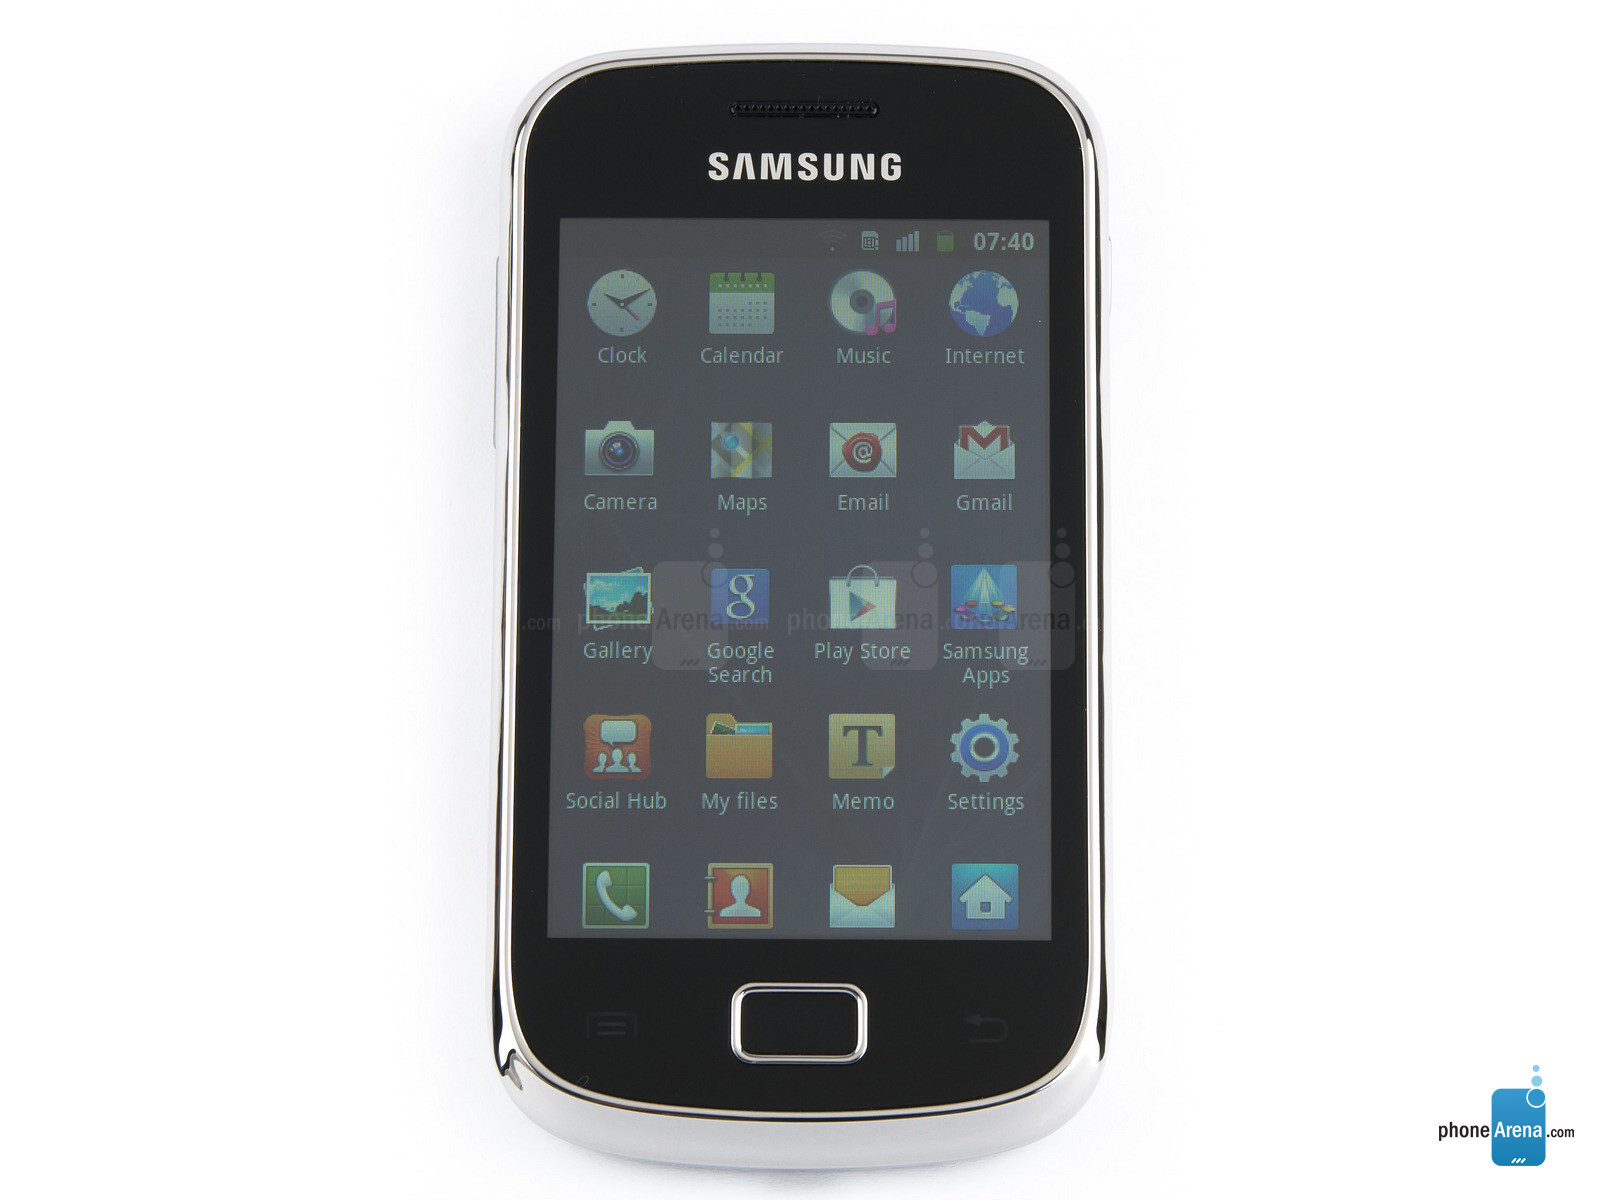 samsung galaxy mini 2 photos rh phonearena com Samsung Galaxy III User Manual Samsung Galaxy J3 User Manual